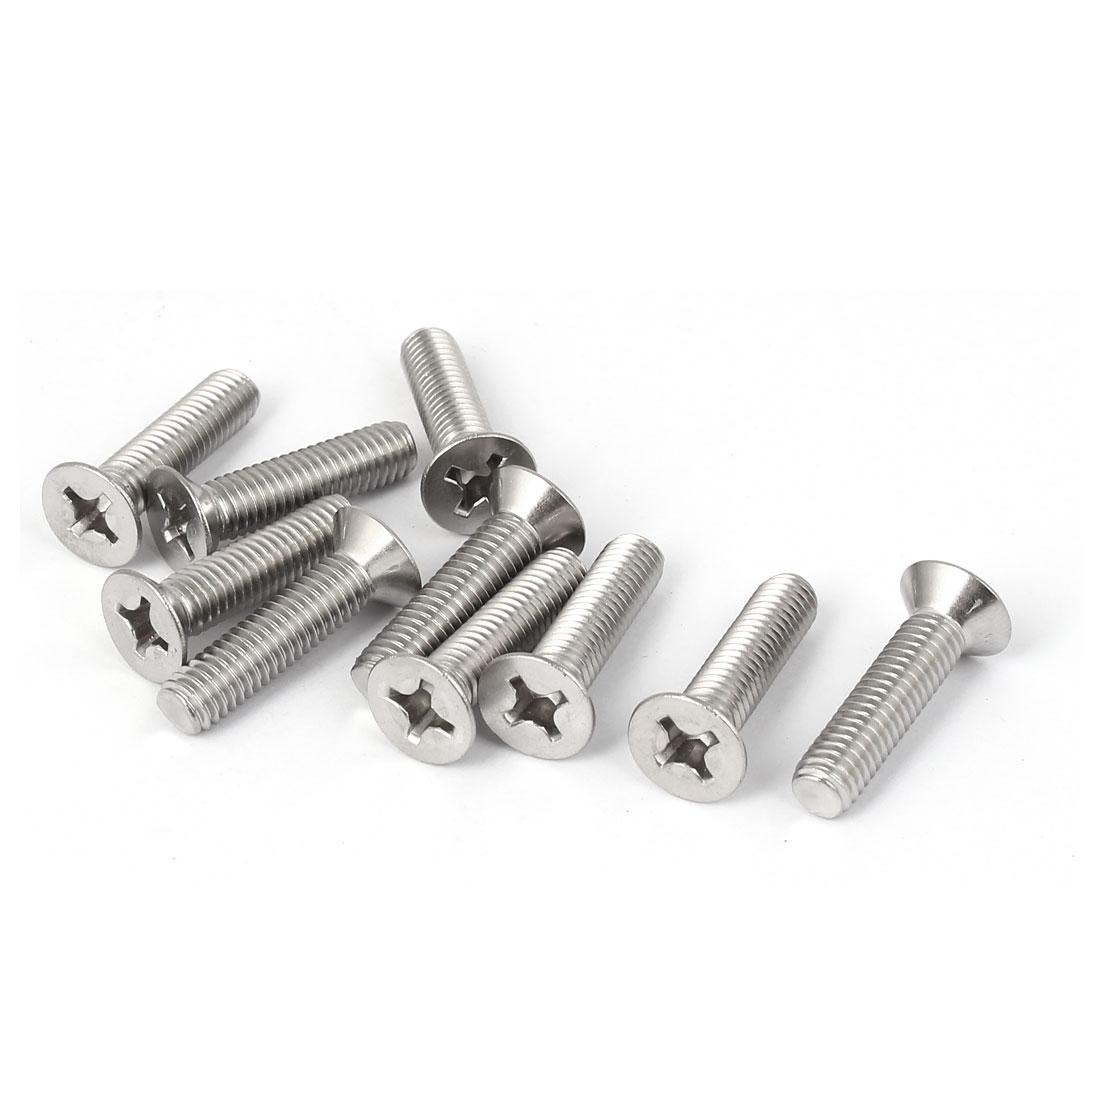 10 Pcs M6x25mm 316 Stainless Steel Flat Head Phillips Machine Screws Fasteners